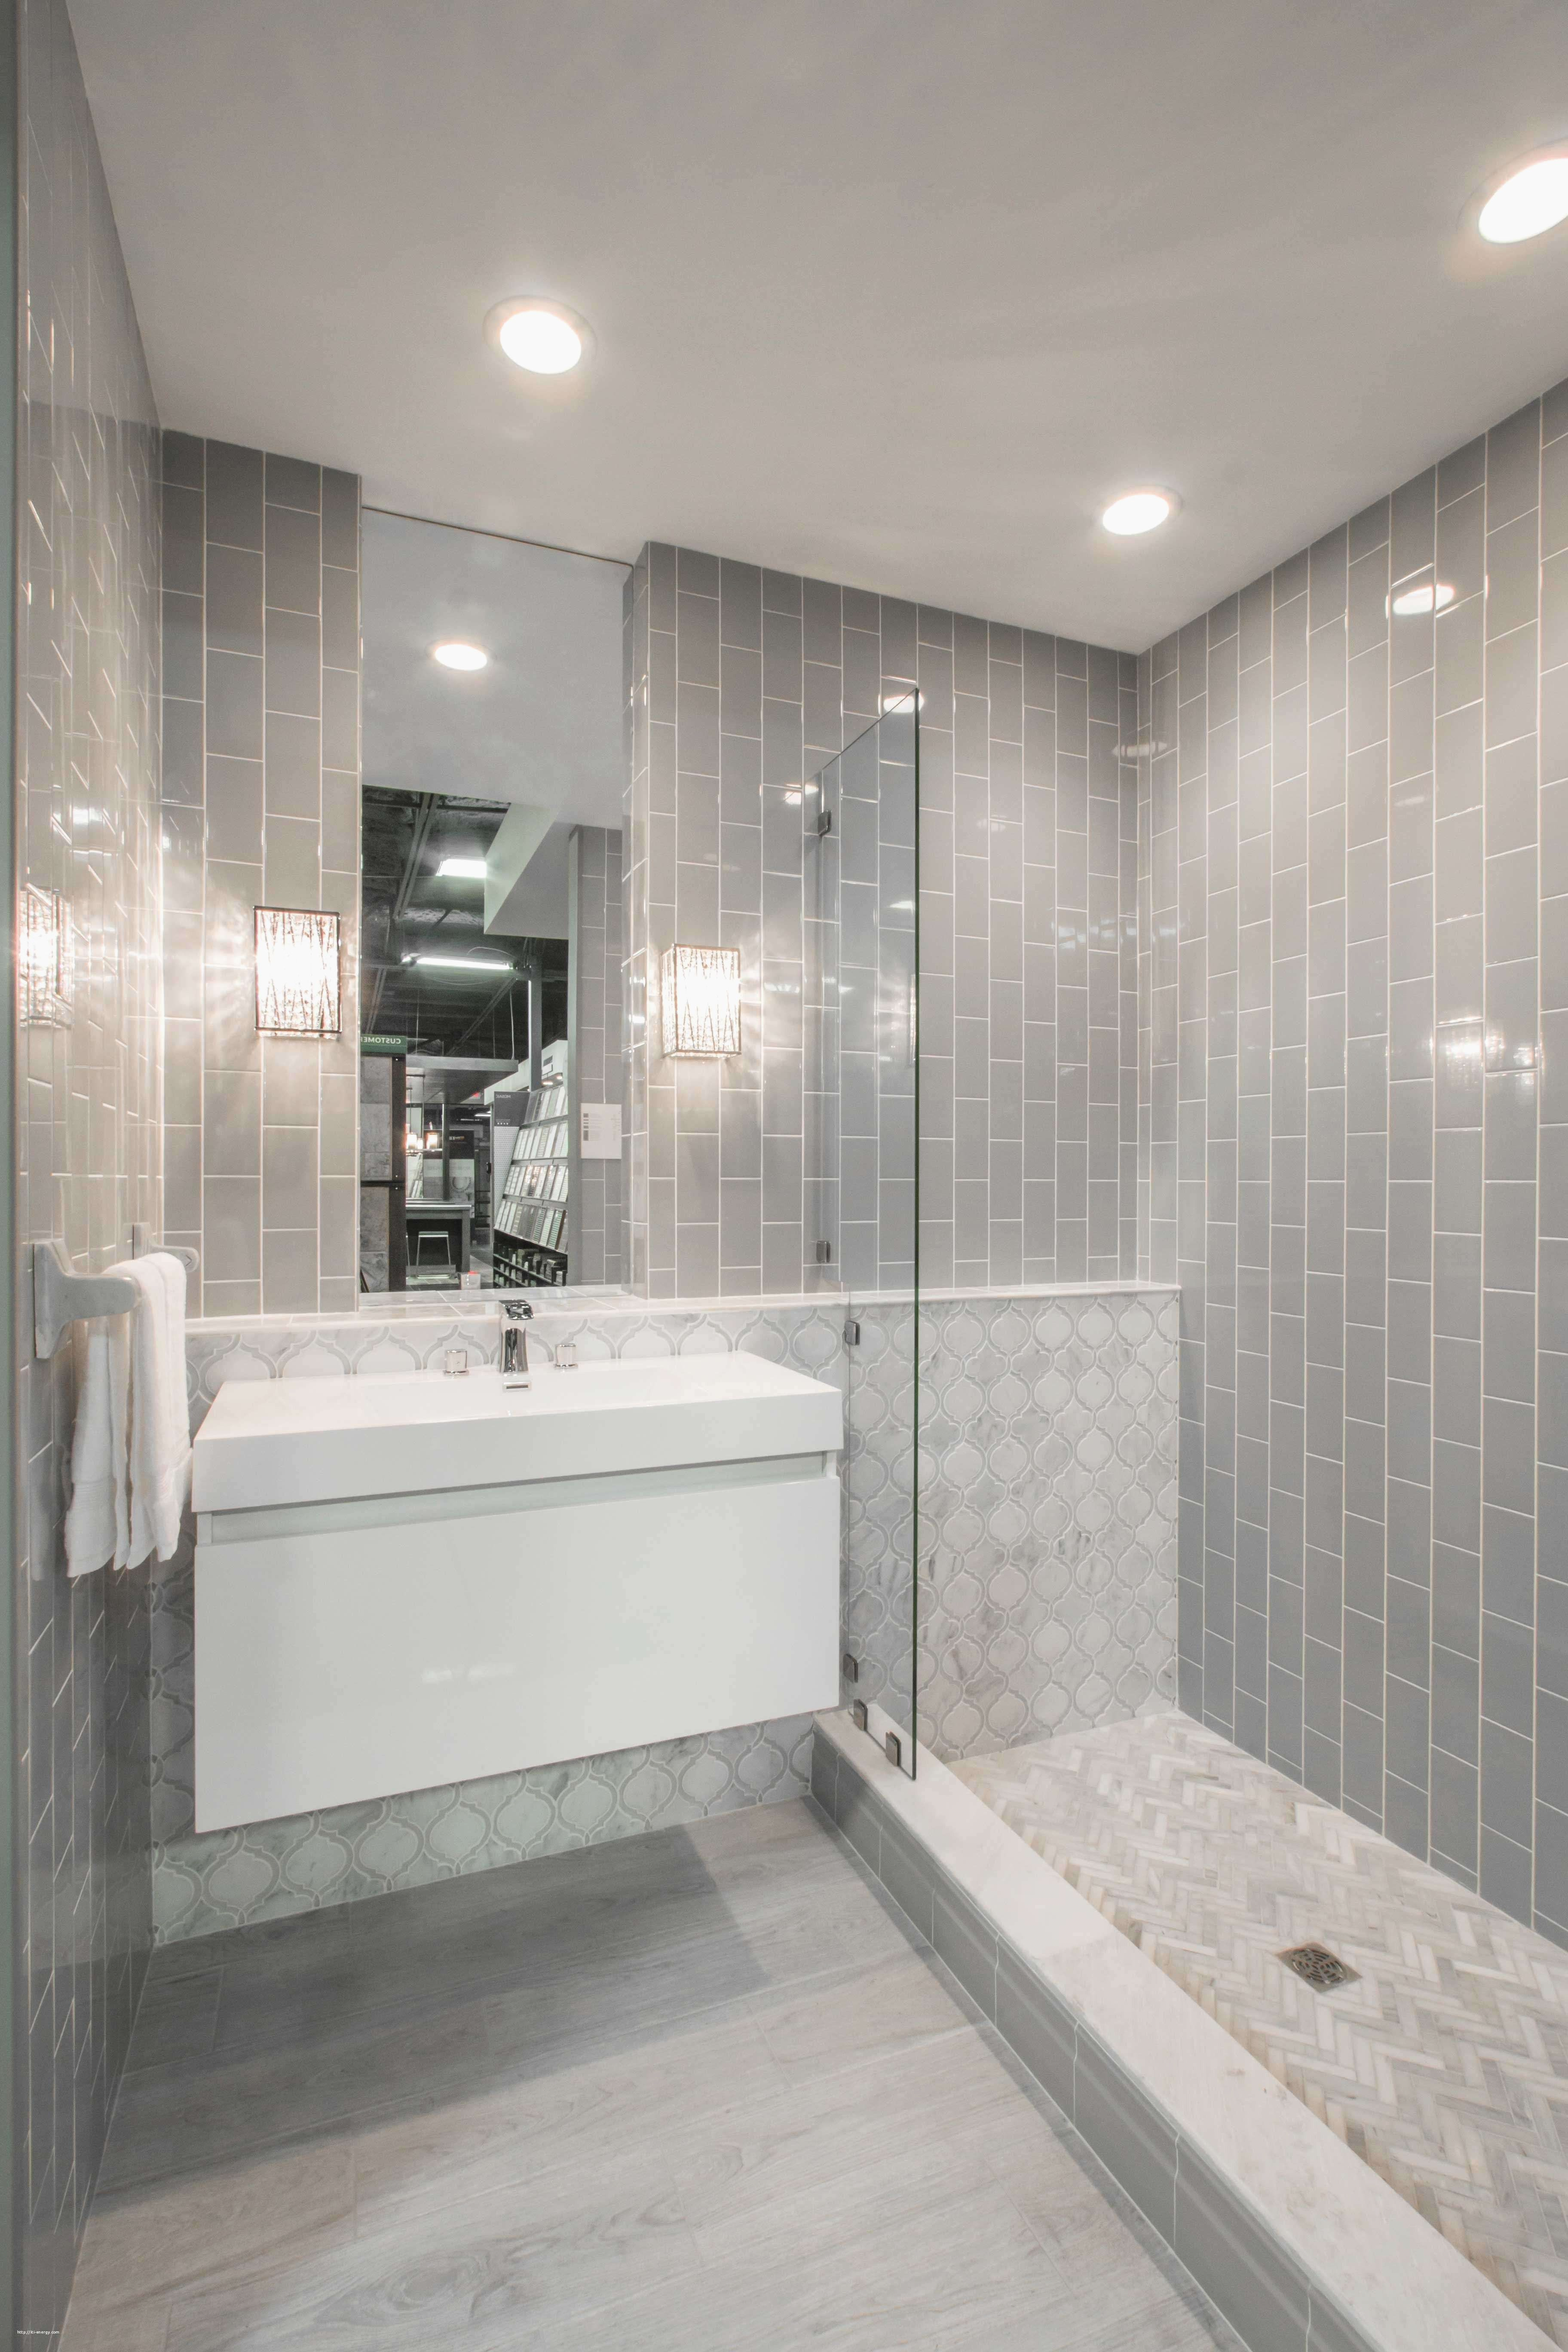 12 White Modern Bathroom Ideas Most Fashionable And Also Stunning Modern Bathroom Remodel Modern Bathroom Modern Bathroom Design